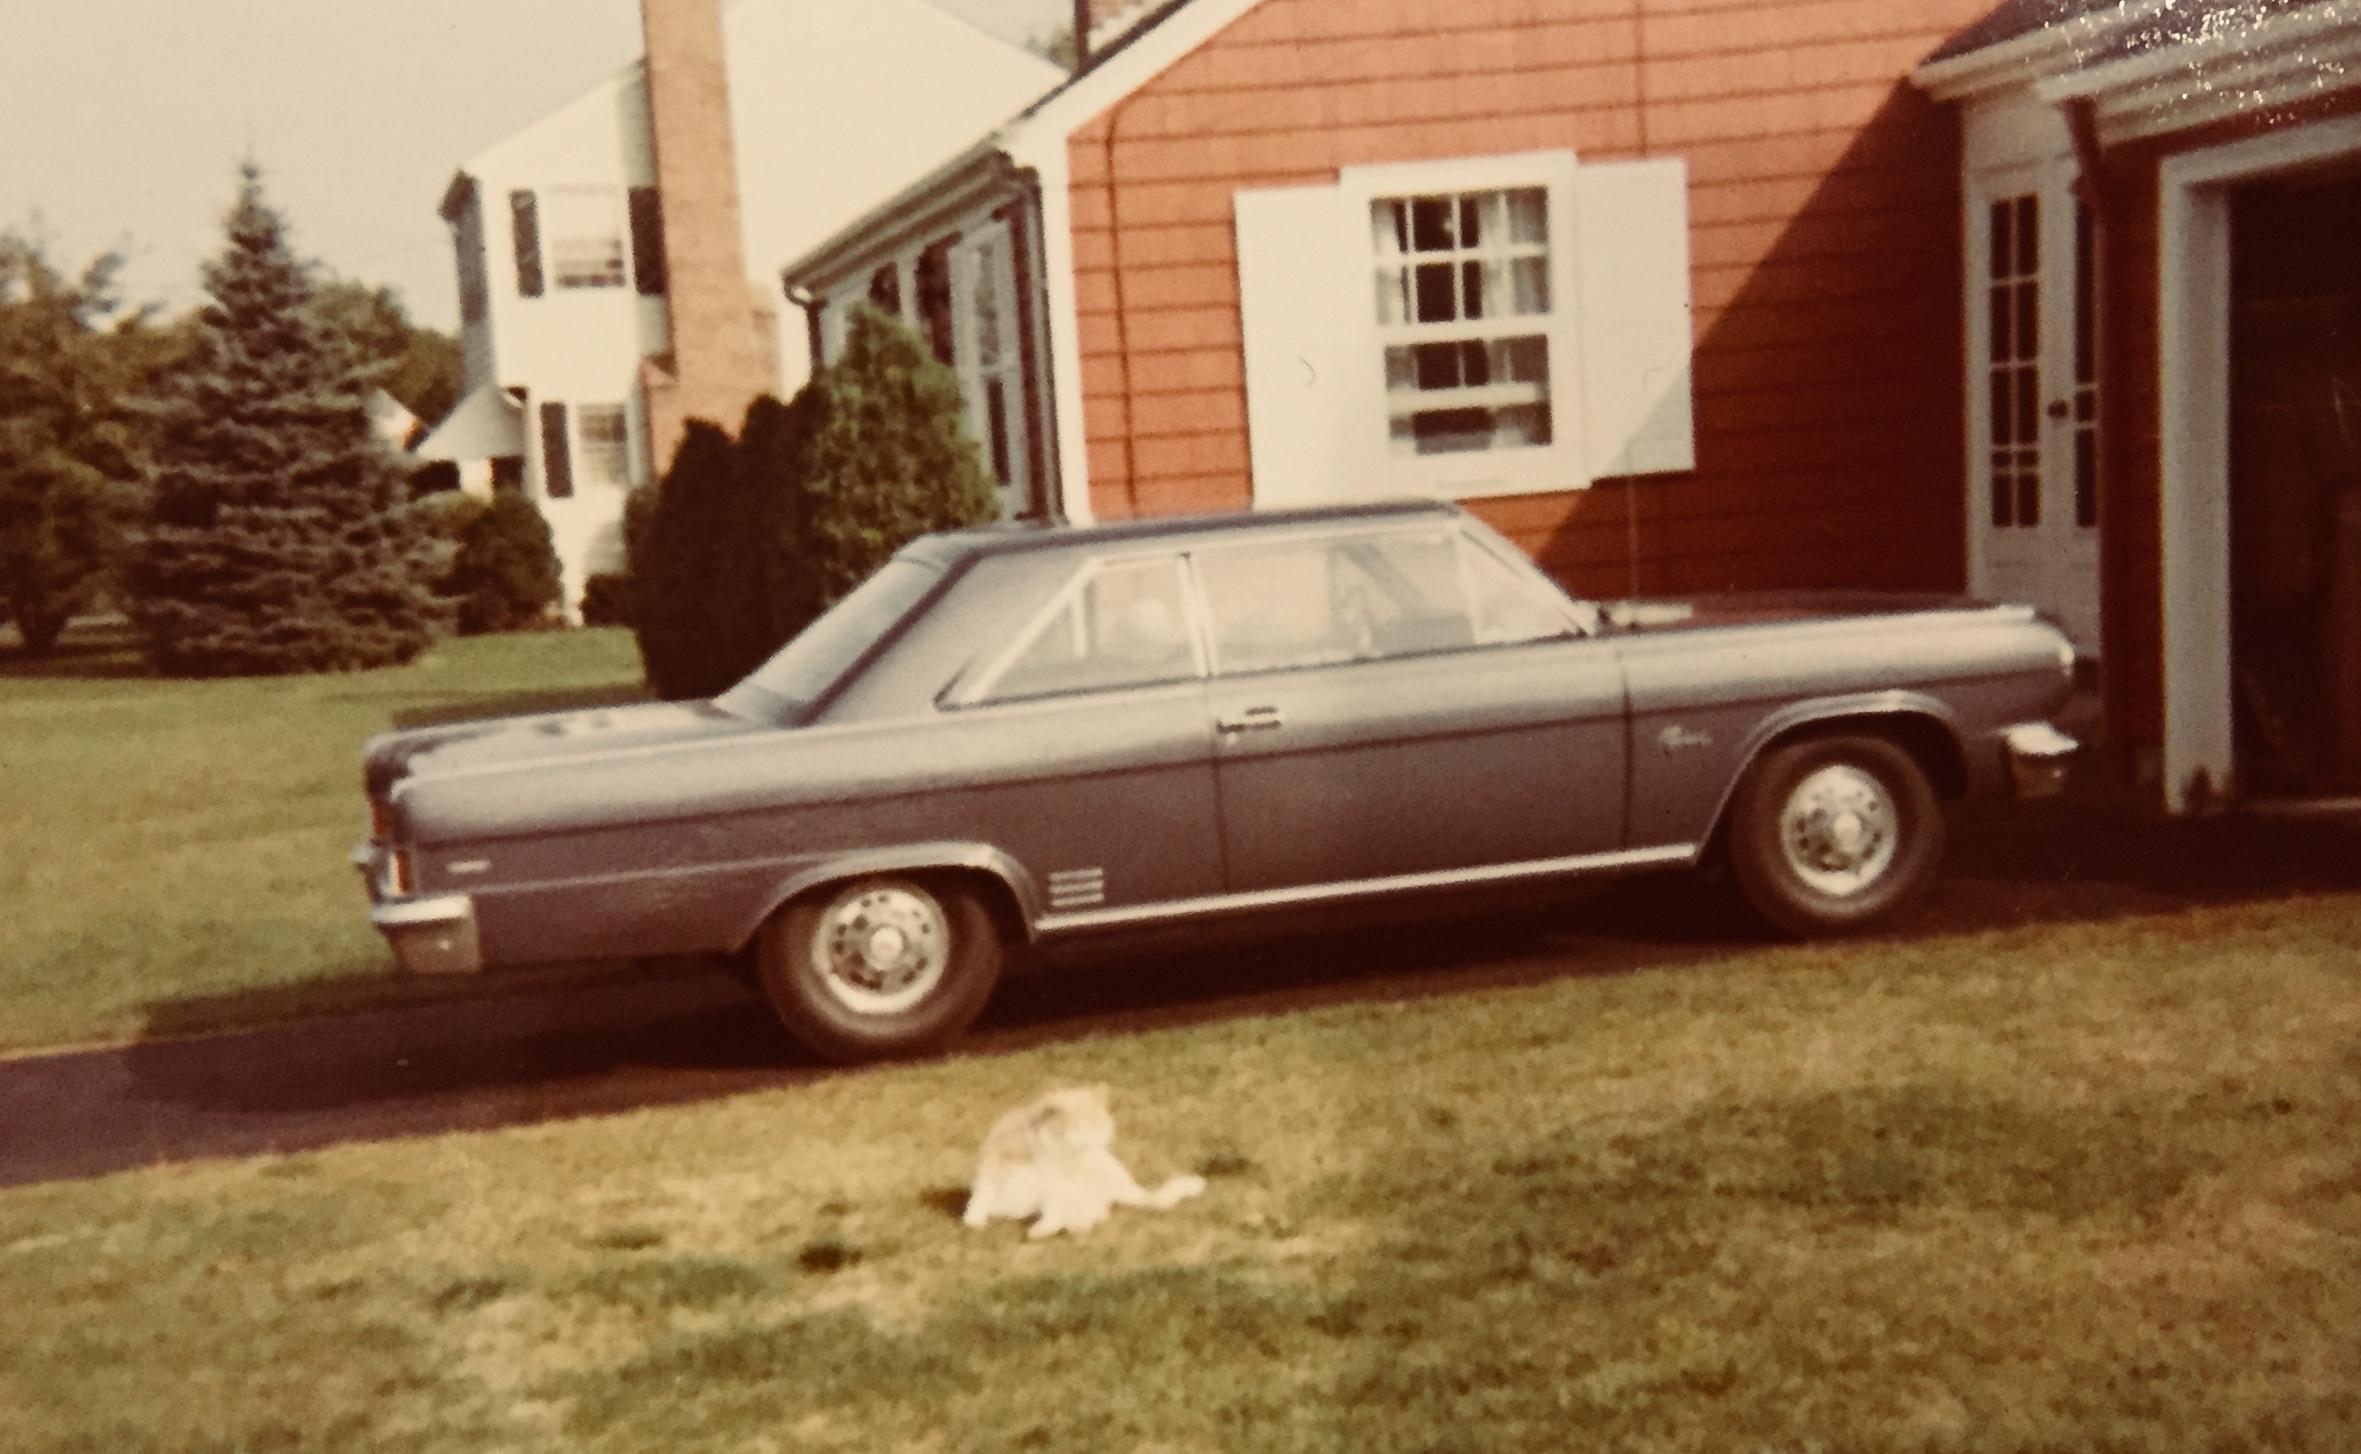 Mom's ill-fated '66 Rambler Rebel